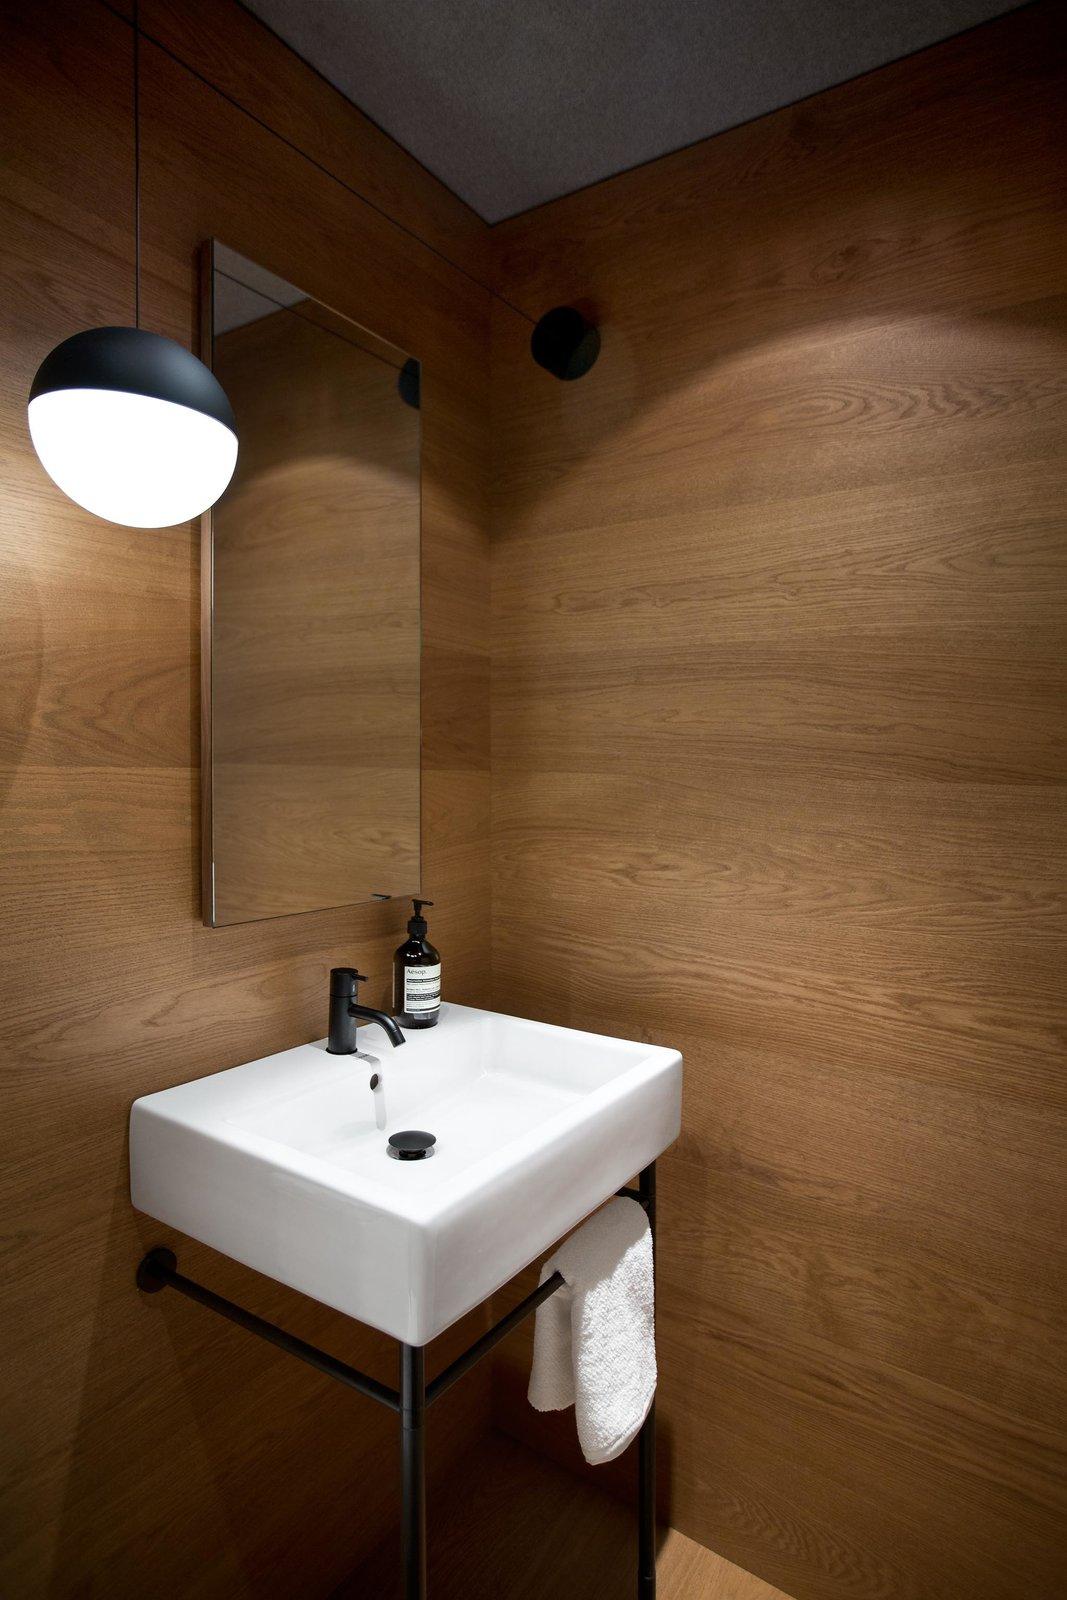 Bath, Medium Hardwood, Pedestal, Ceiling, and Pendant Duravit sink & pedestal, Vola faucet, Flos String Light pendant  Bath Medium Hardwood Ceiling Pendant Photos from Beatty Street Loft